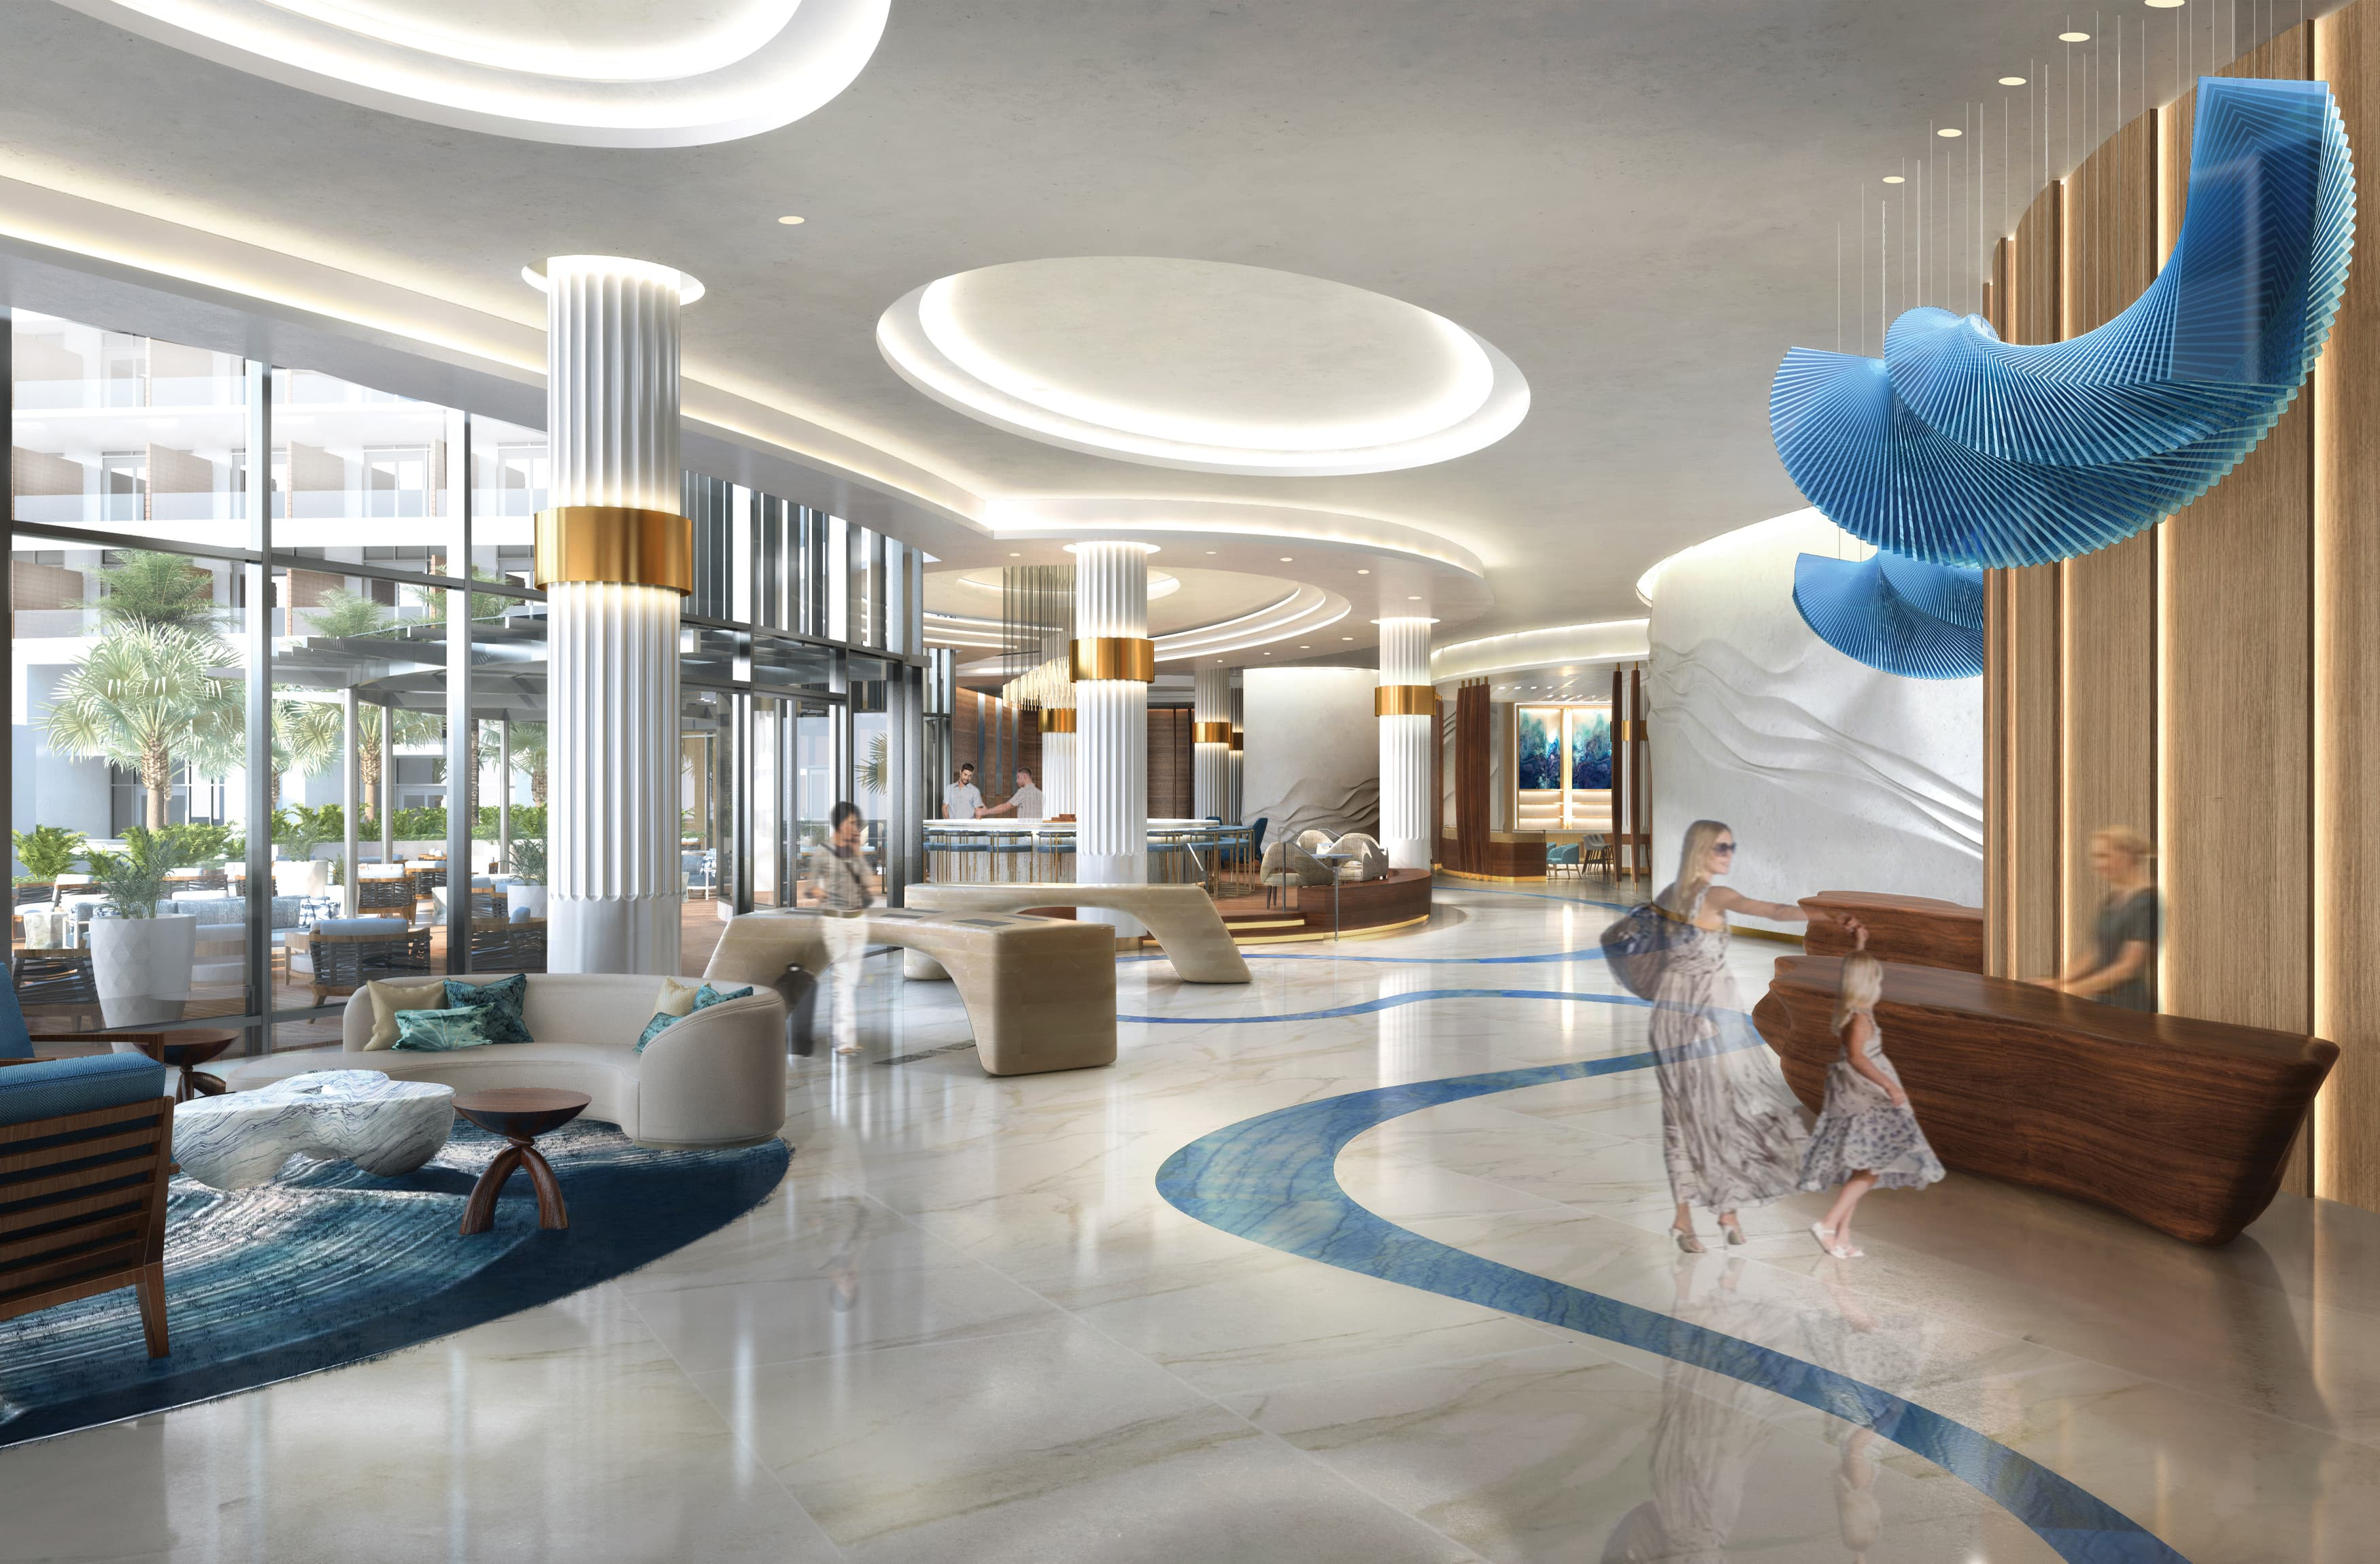 Pier Sixty-Six Hotel & Marina. Hospitality Design. Lobby Design. luxury resort destination, marina and residential mixed-use development.